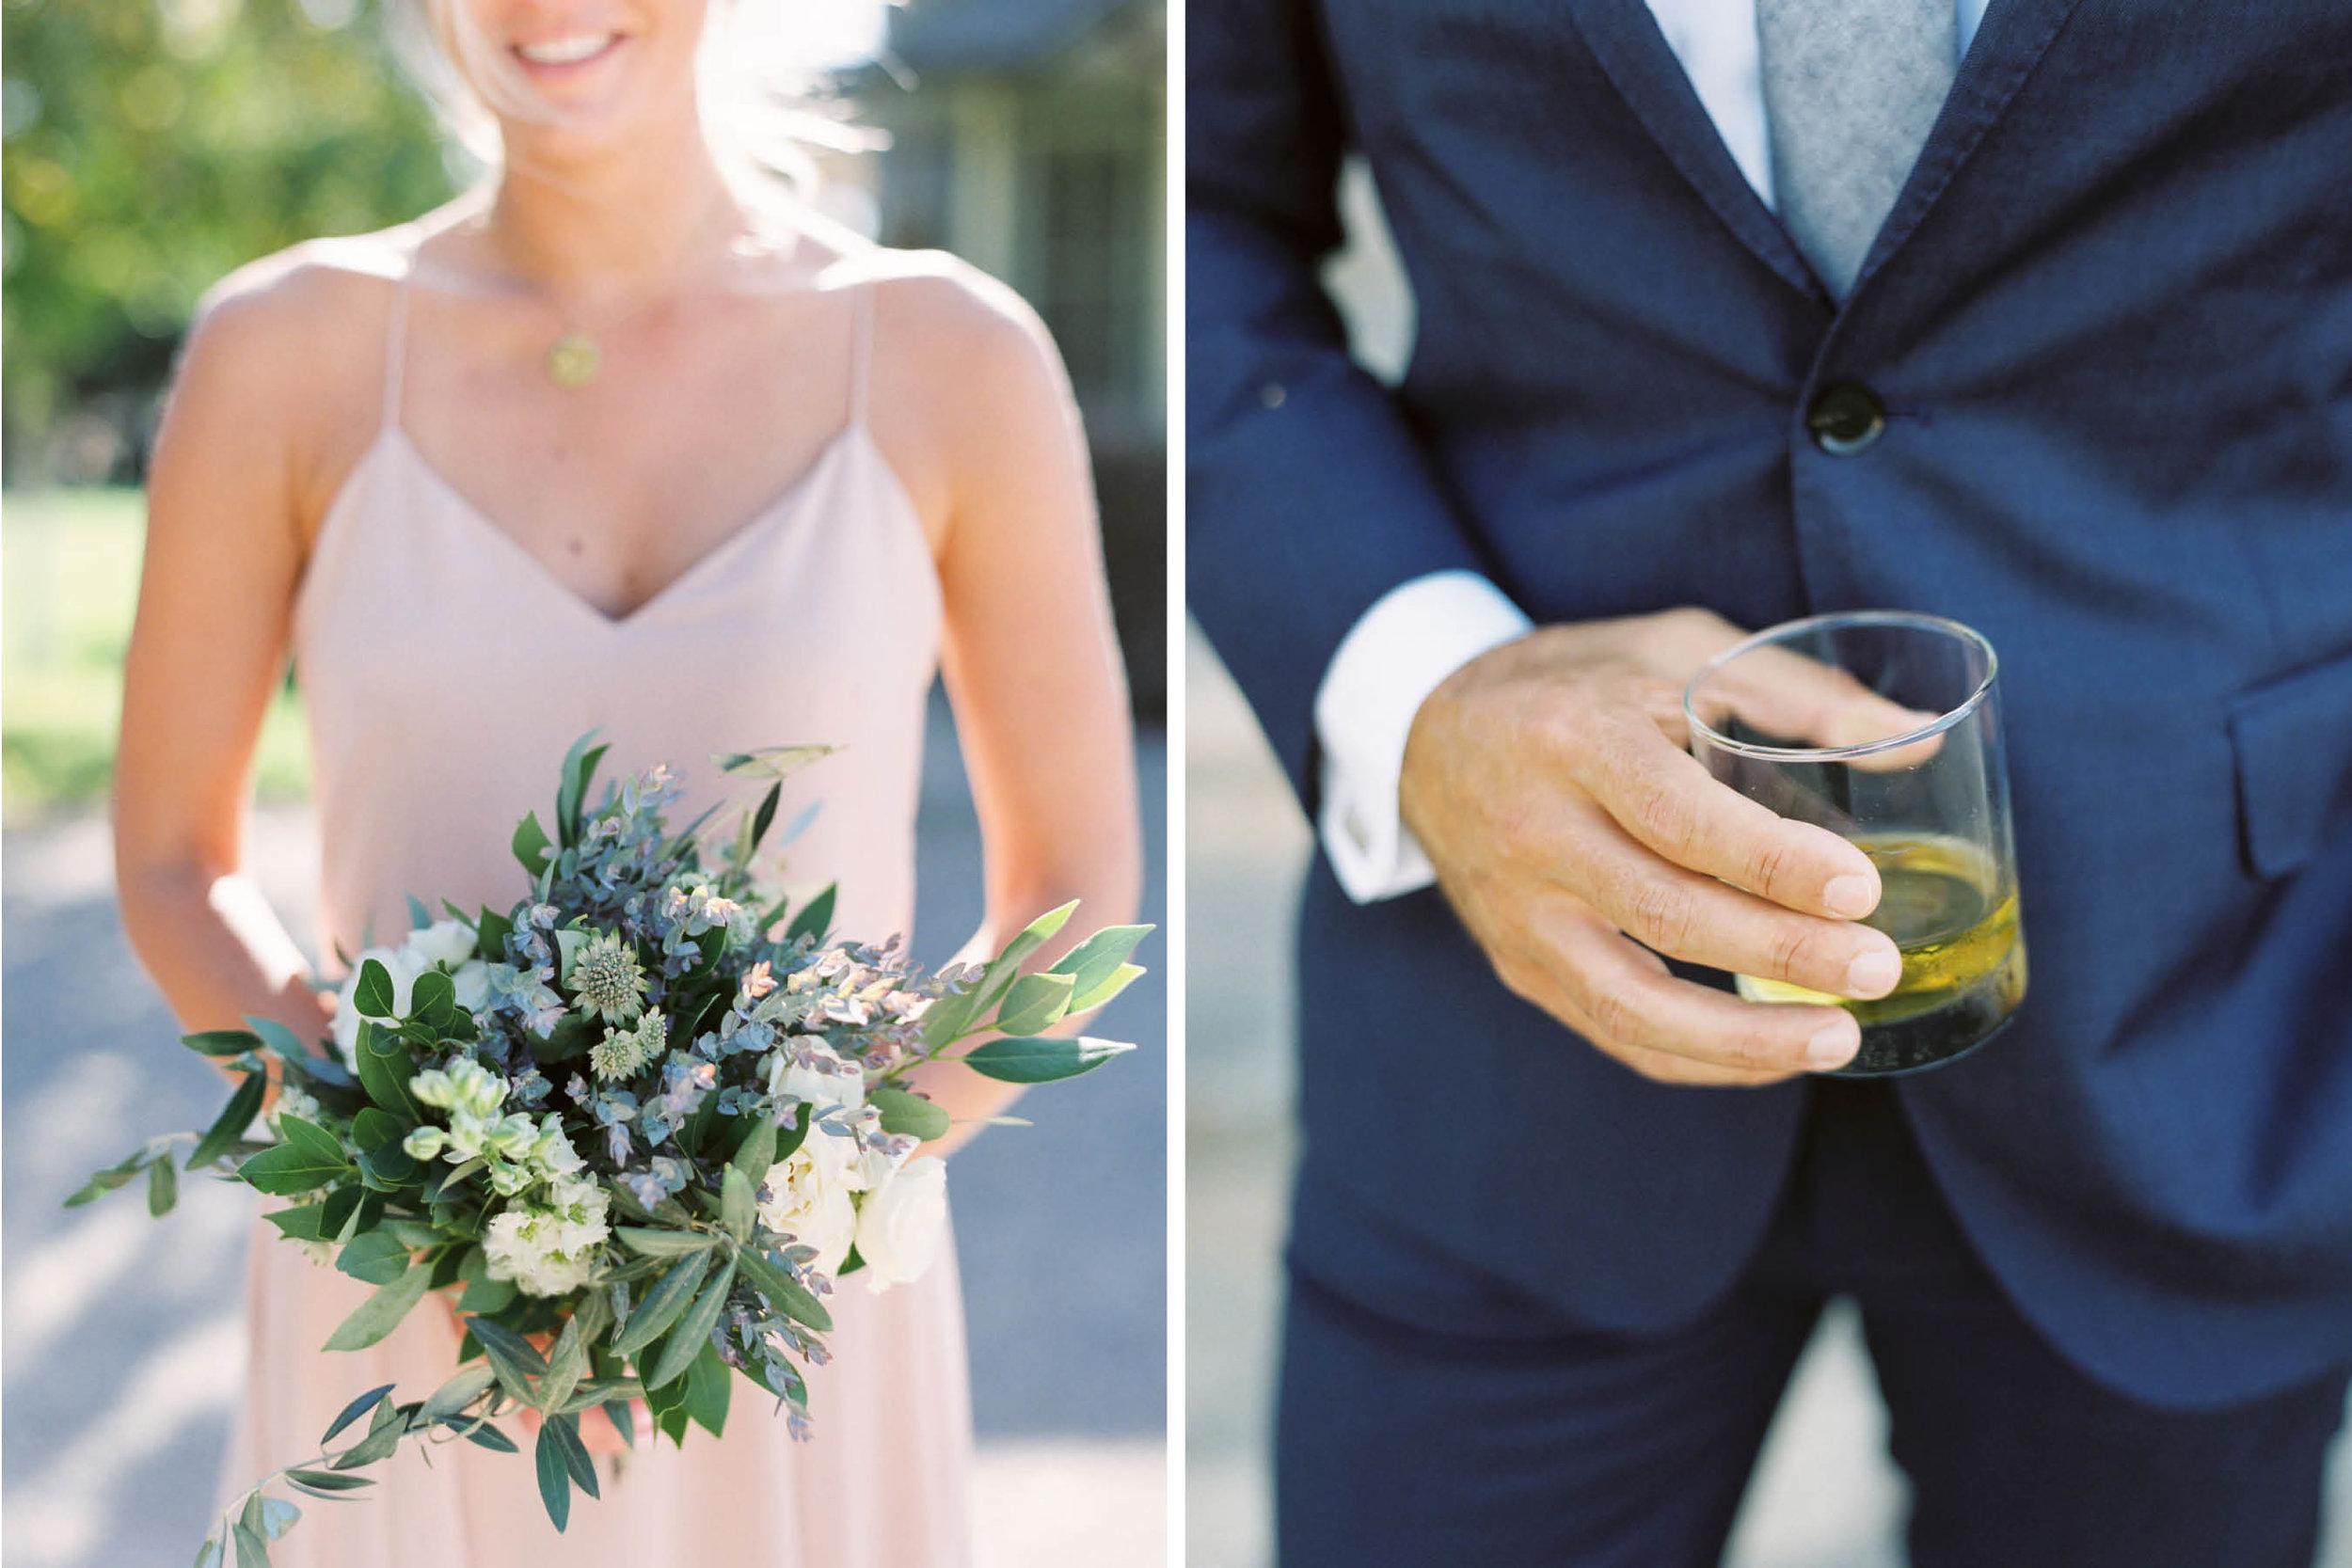 alegria-by-design-wedding-planner-planning-event-design-coordinator-day-of-month-crossroads-estate-garden-vineyard-firestone-barn-location-rustic-santa-barbara (1 (7).jpg